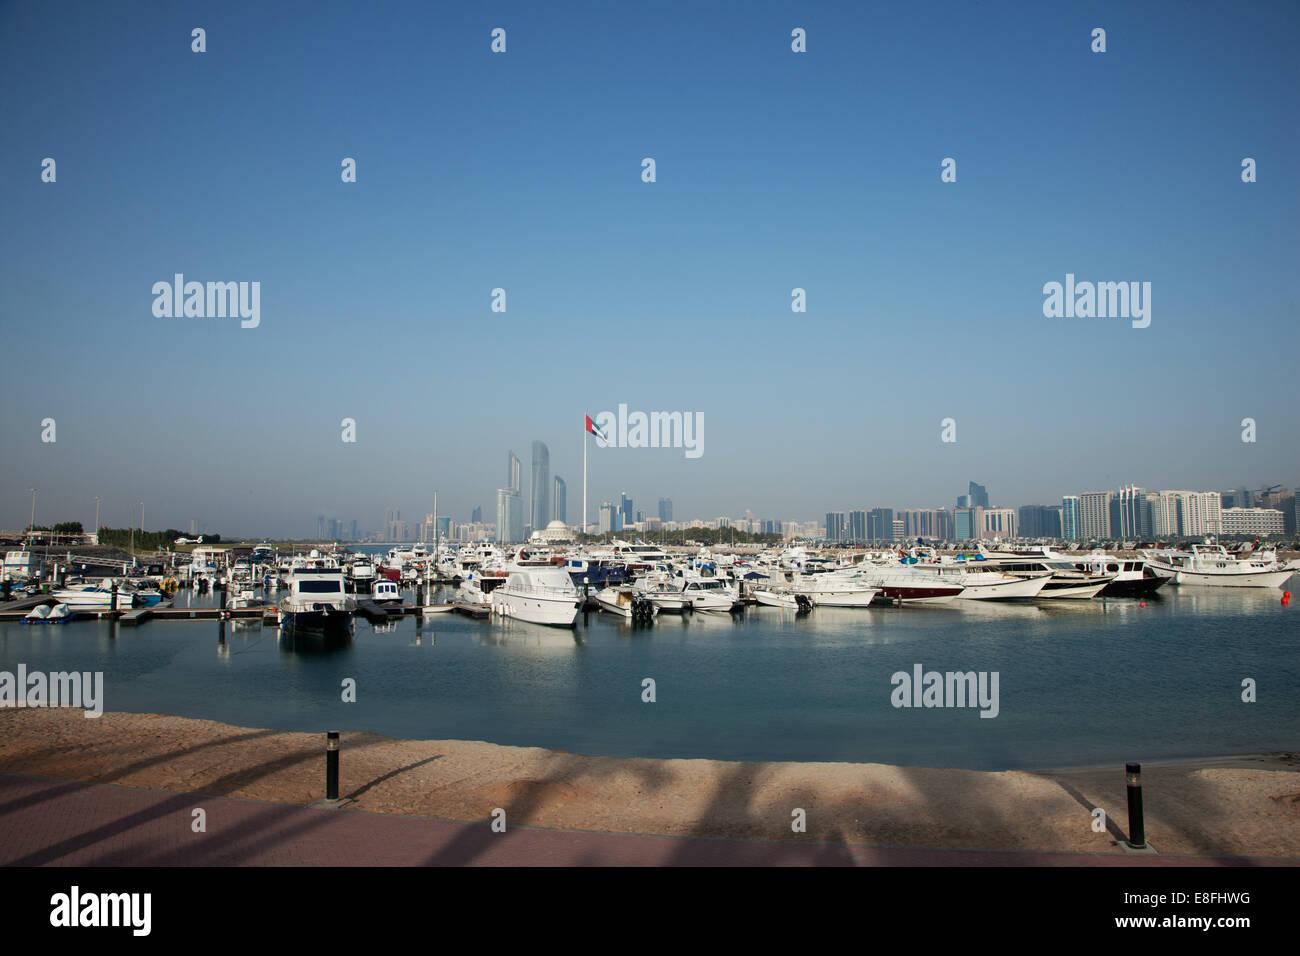 Los Emiratos Árabes Unidos, Abu Dhabi, Skyline con Harbour en primer plano Imagen De Stock